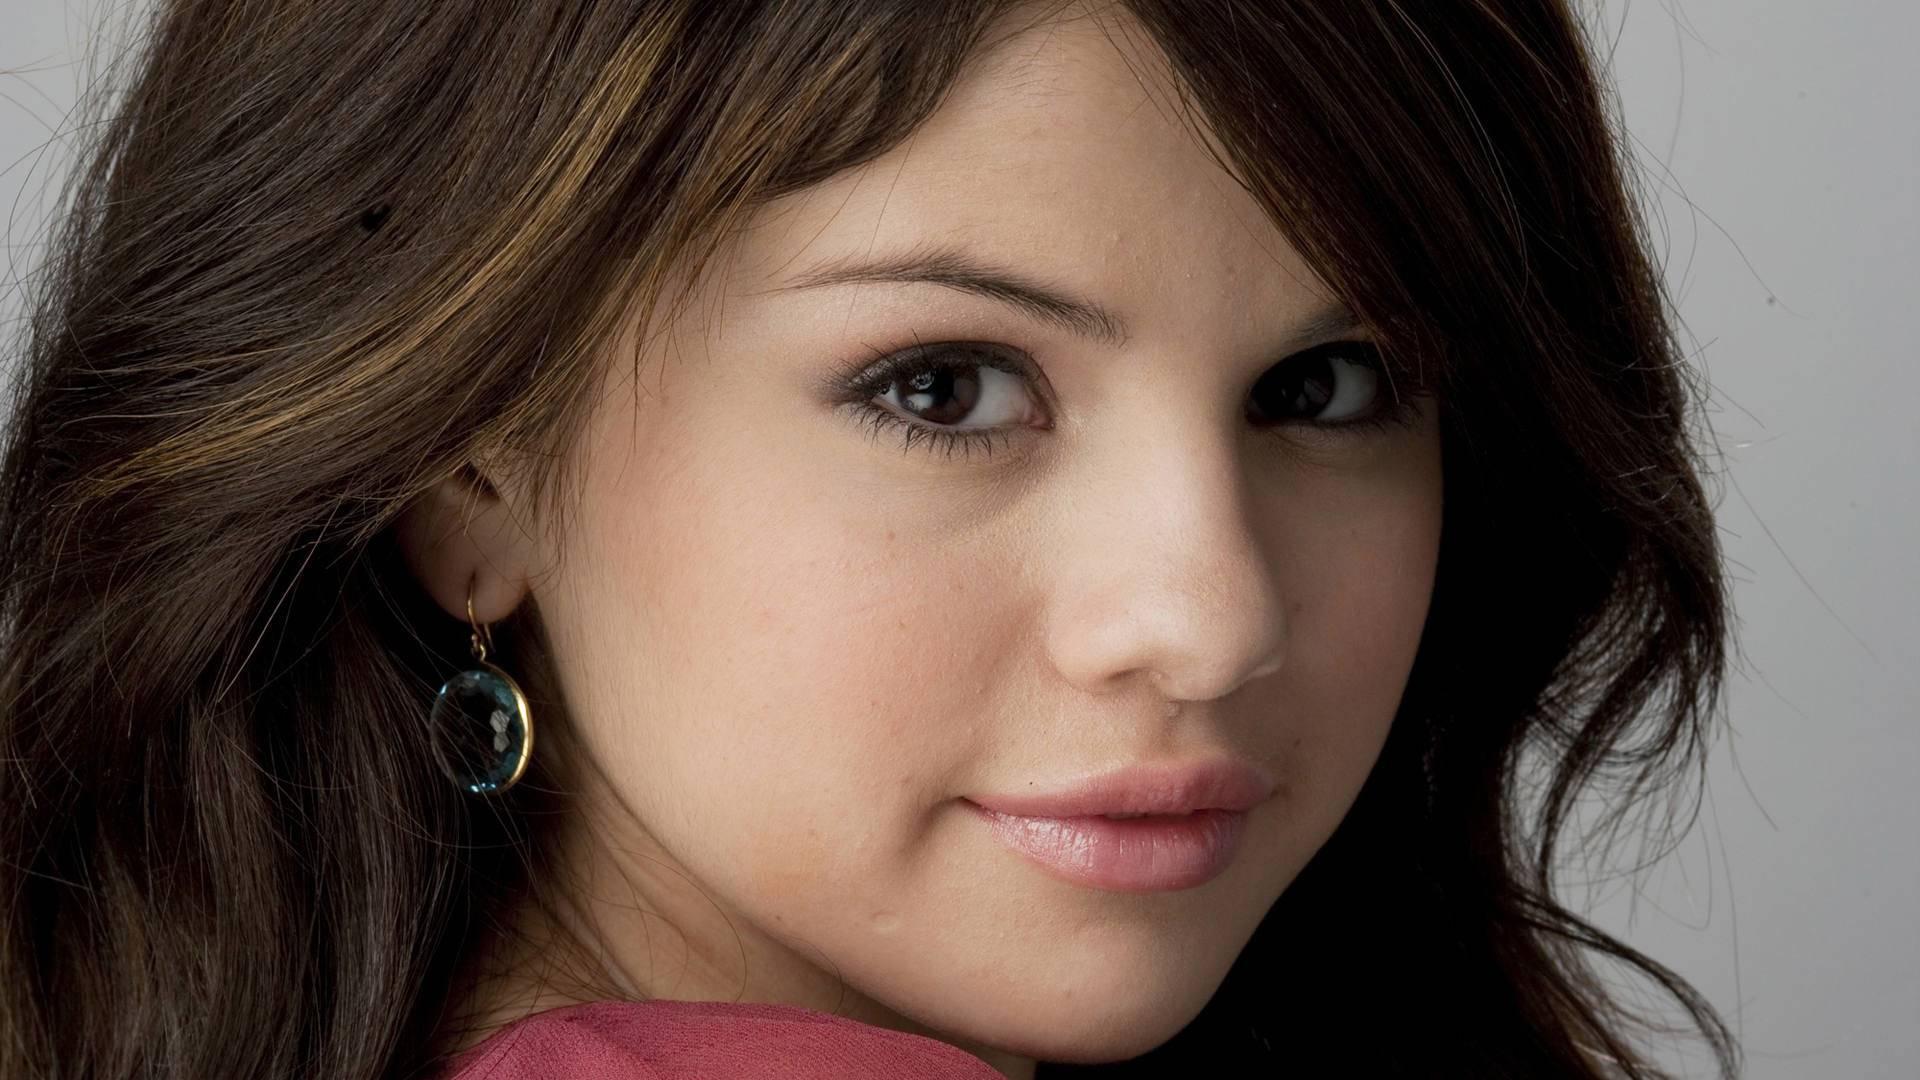 Rooney Mara Wallpaper Hd Selena Gomez Hd Wallpapers